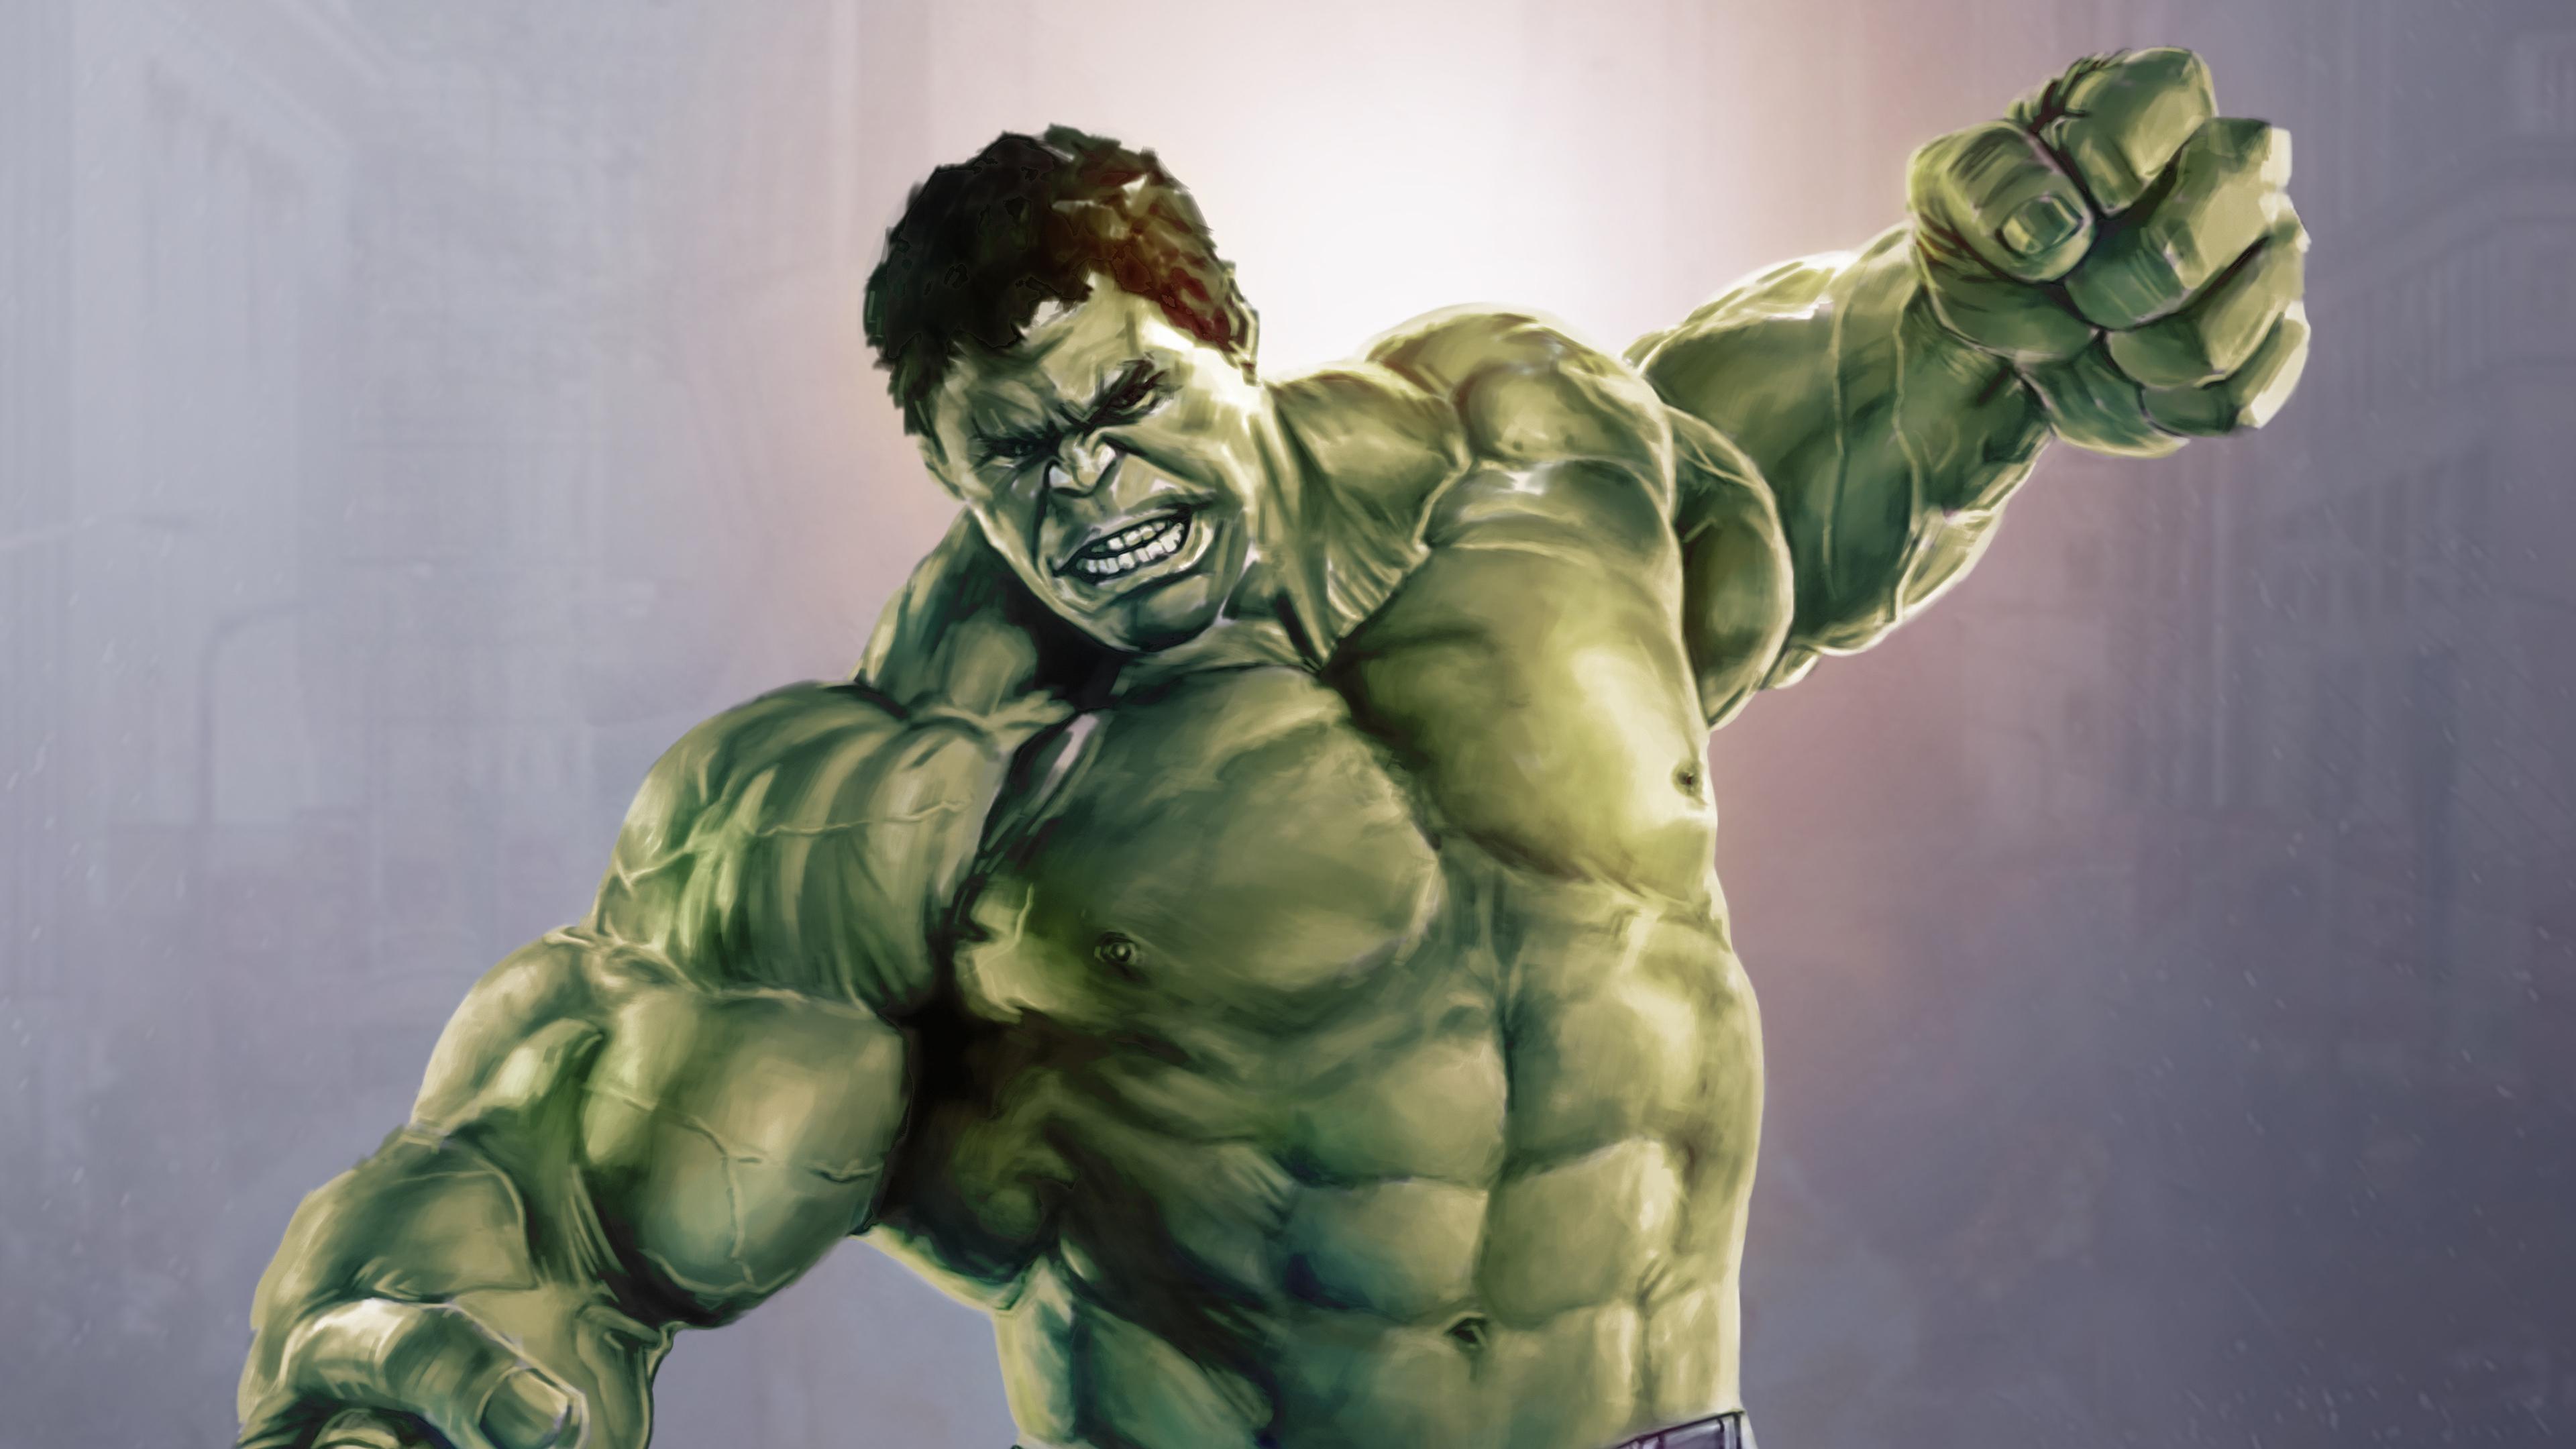 3840x2160 Incredible Hulk Avengers 4k HD 4k Wallpapers ...